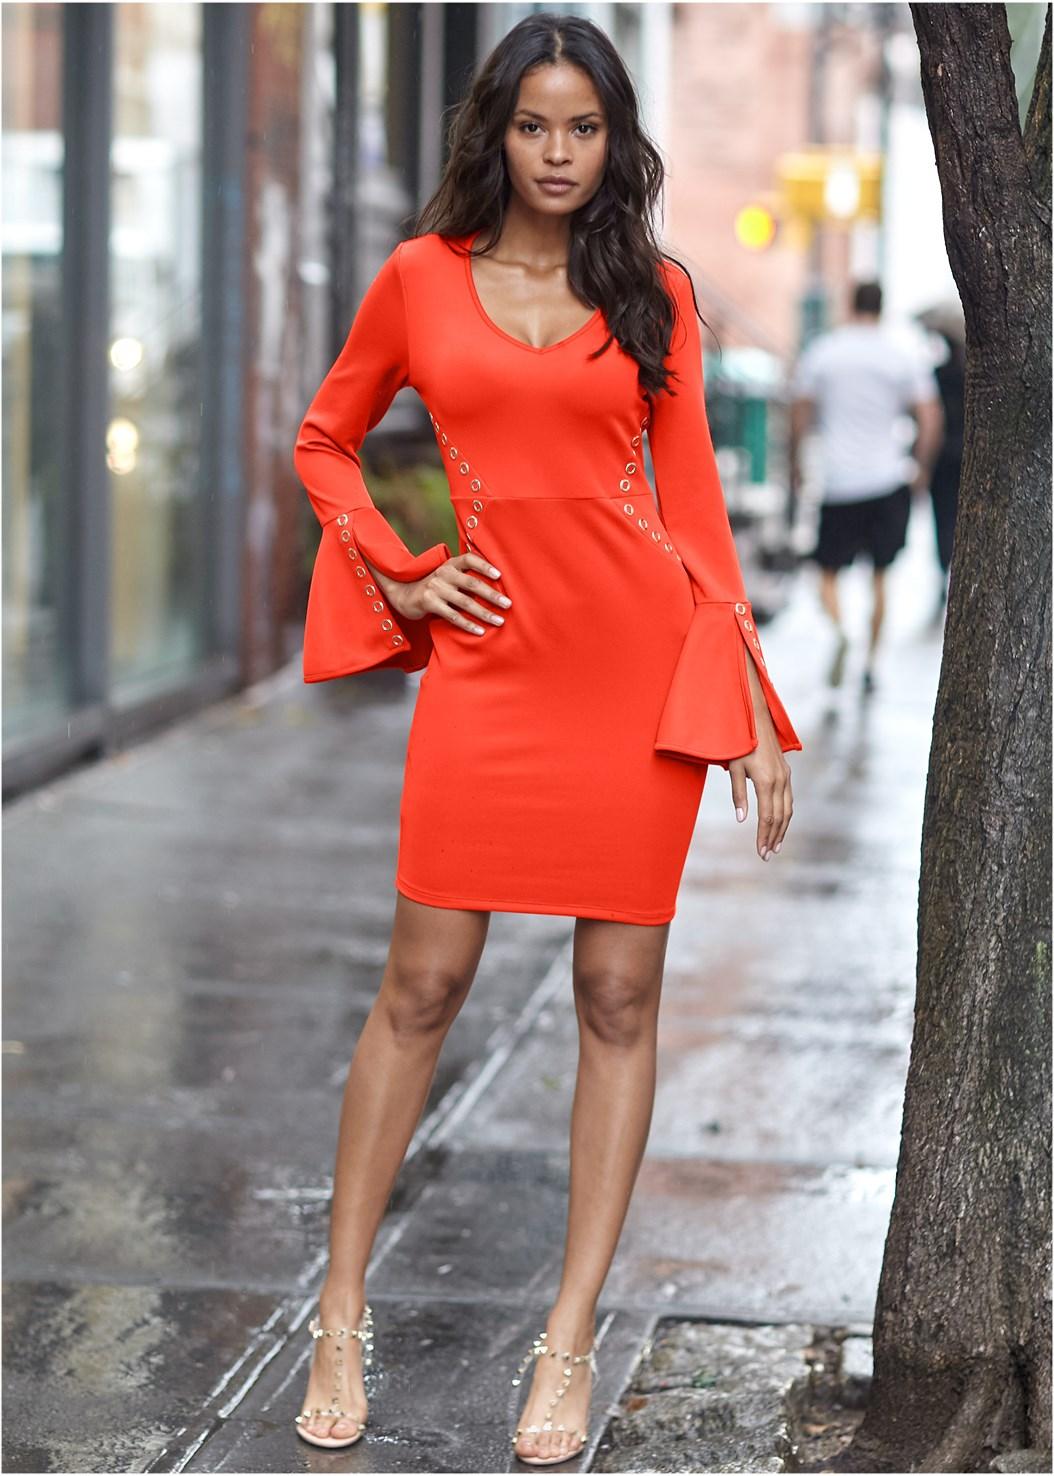 Bodycon Grommet Dress,Transparent Studded Heels